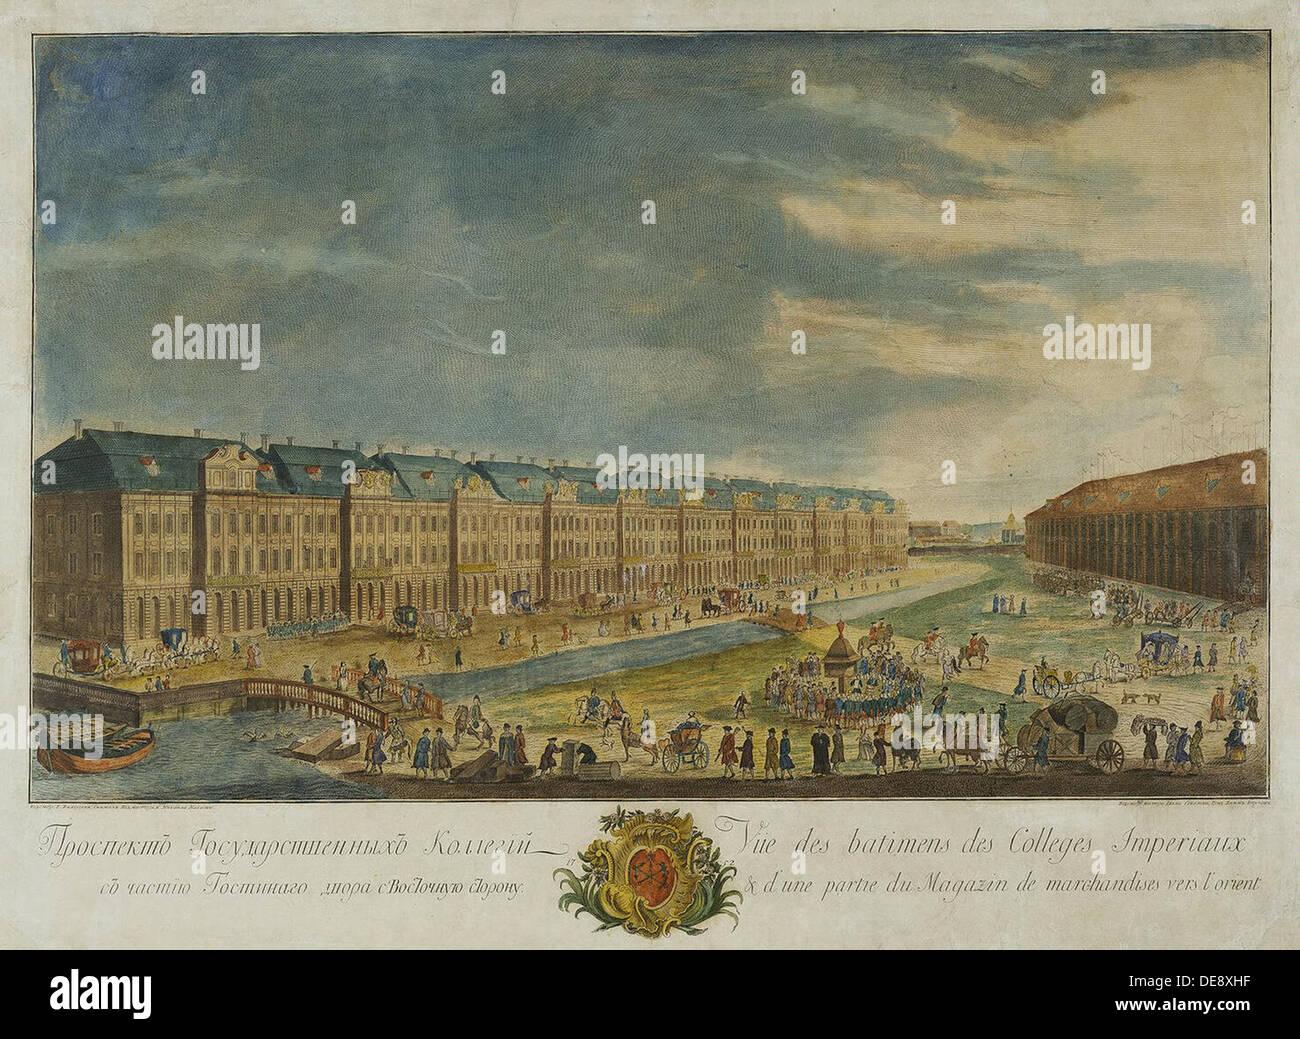 View of the Twelve Collegia building in Saint Petersburg, 1753. Artist: Vnukov, Yekim Terentiyevich (1723/25-1762/63) - Stock Image